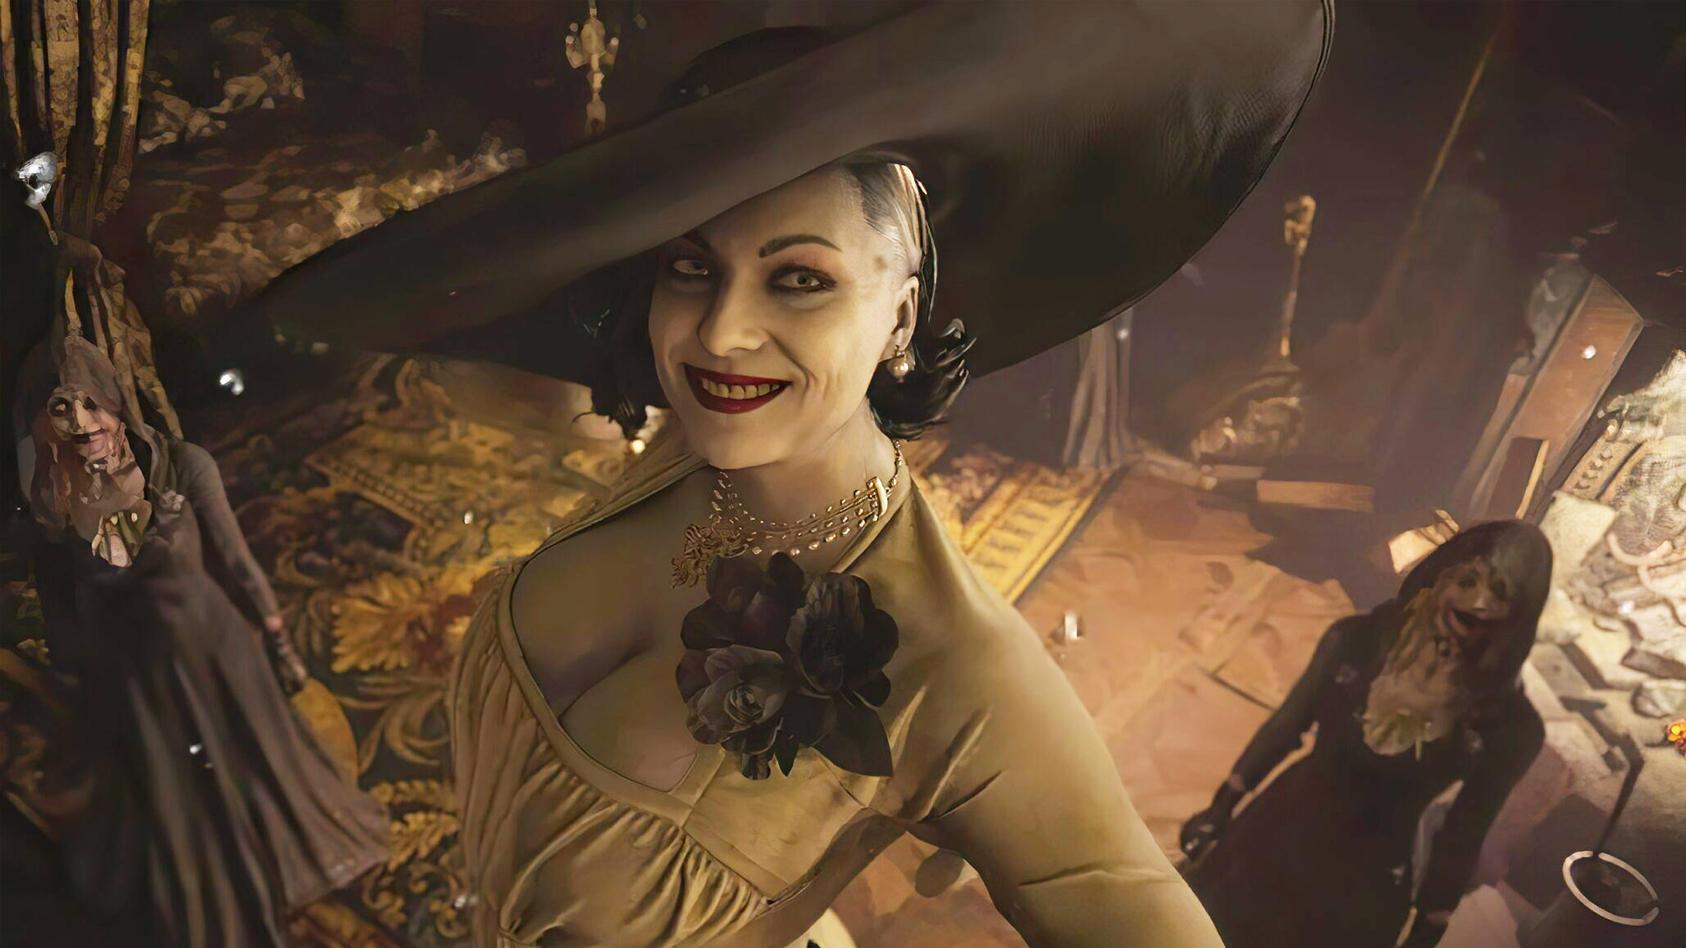 Die übergroße Lady Dimitrescu ist ganz klar einer der Highlight-Charaktere in Resident Evil 8.